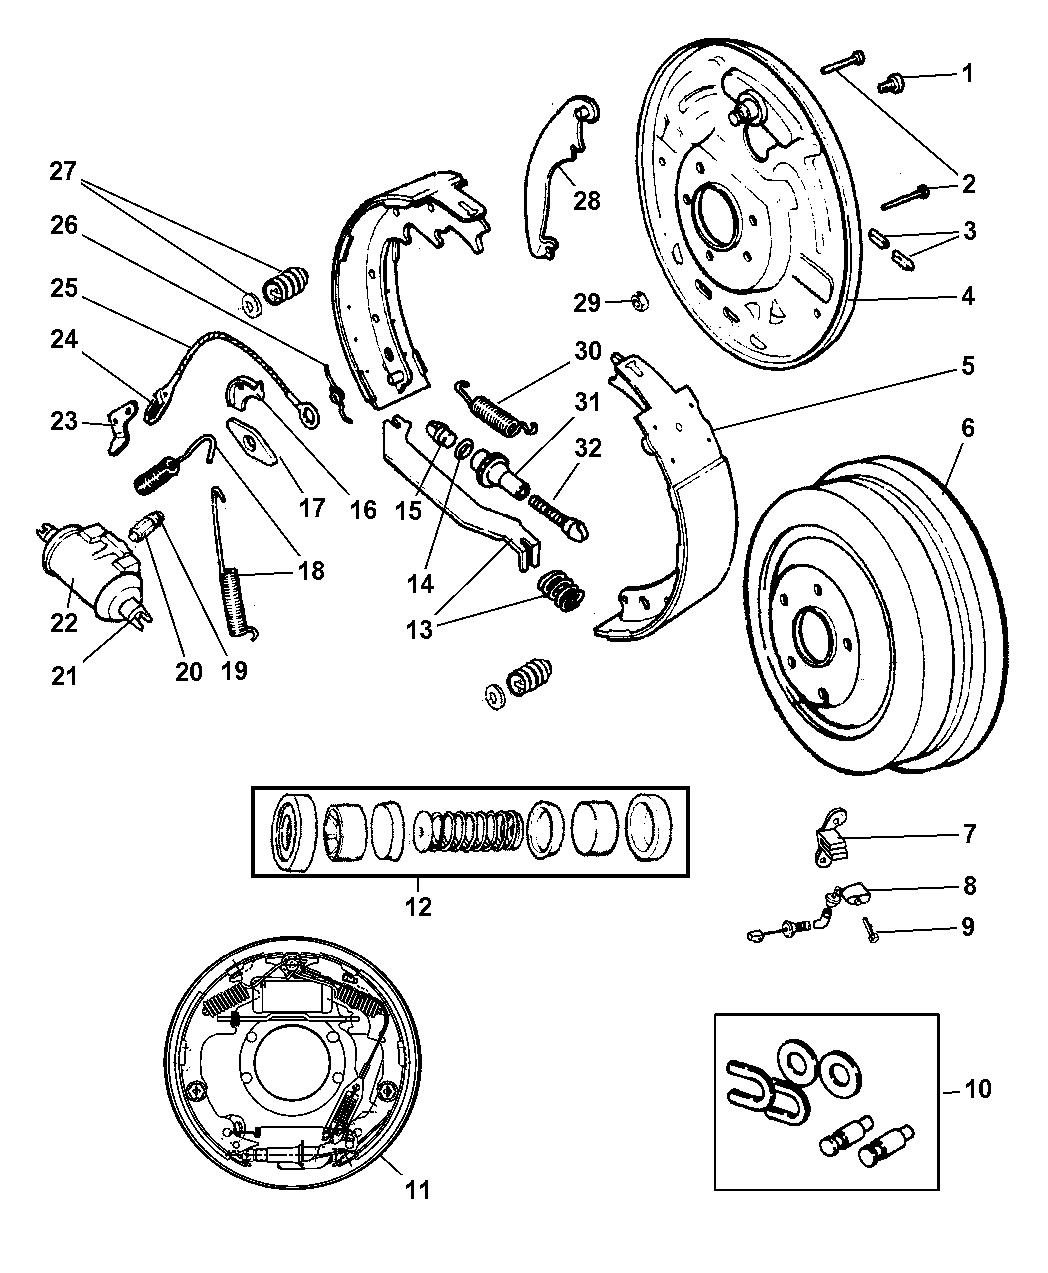 2001 Jeep Wrangler Rear Drum Brakes Mopar Parts Giant Power Wheels Diagram